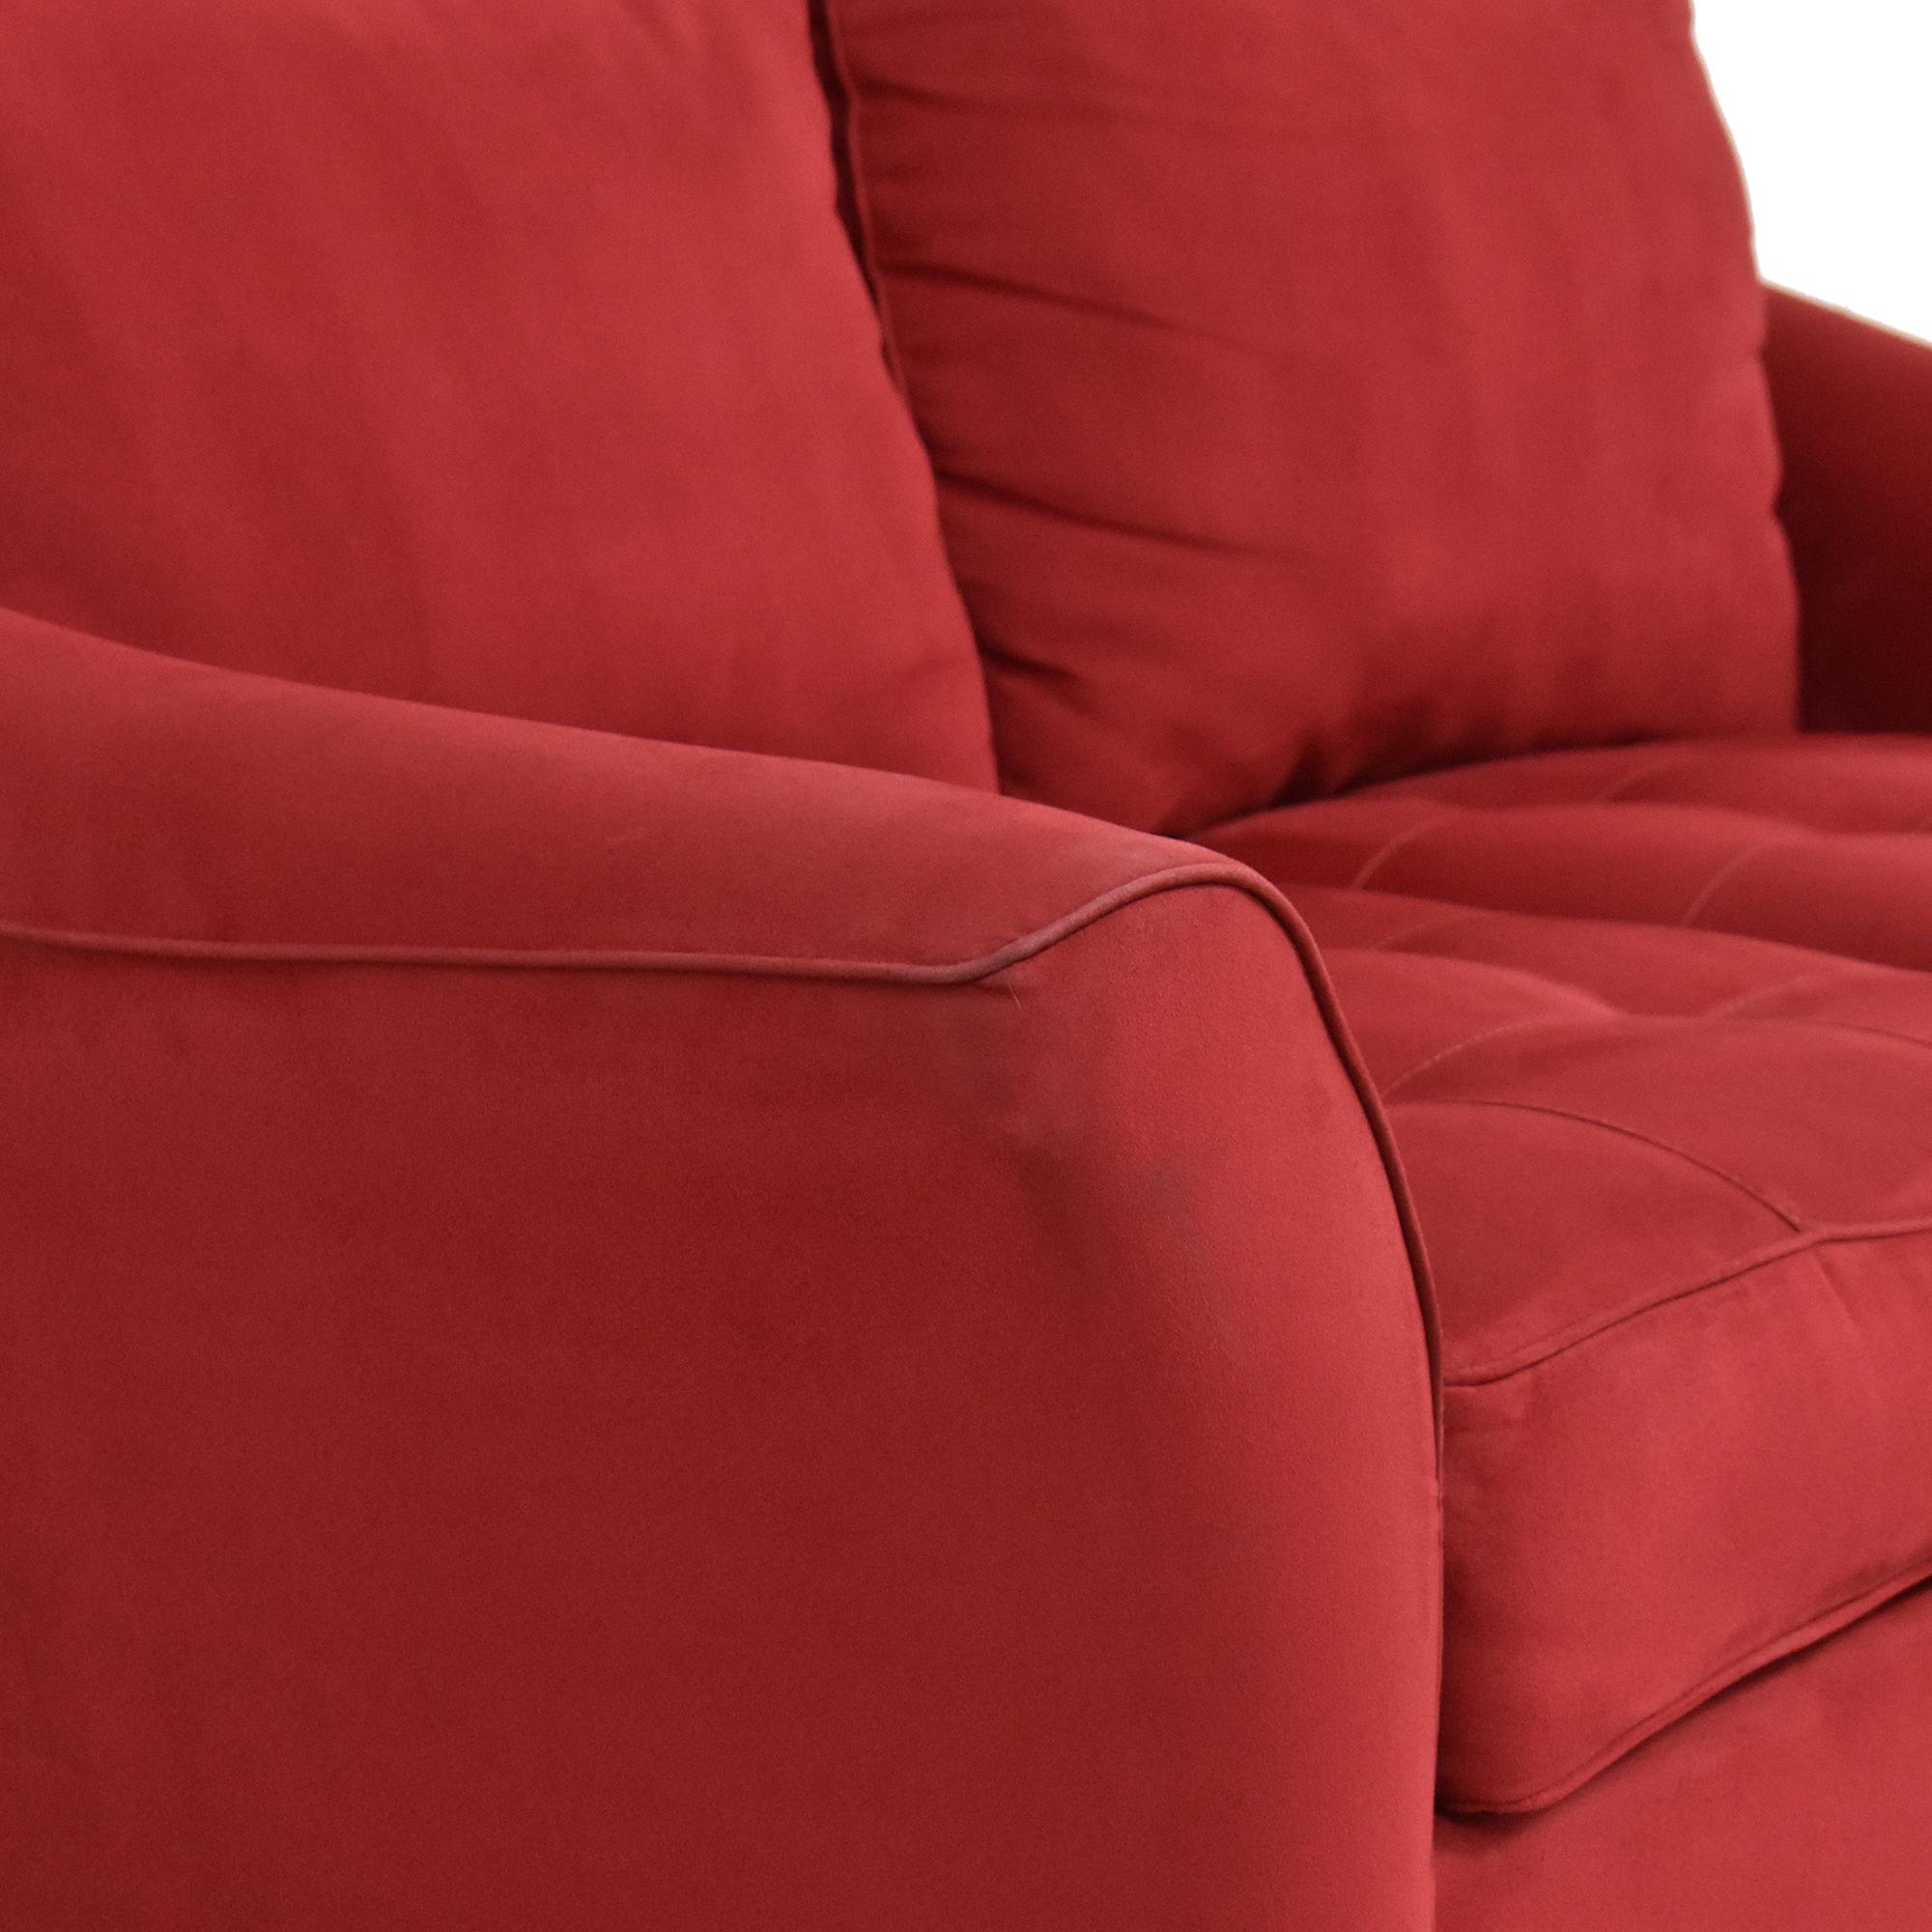 Raymour & Flanigan Raymour & Flanigan Tufted Cushion Loveseat discount